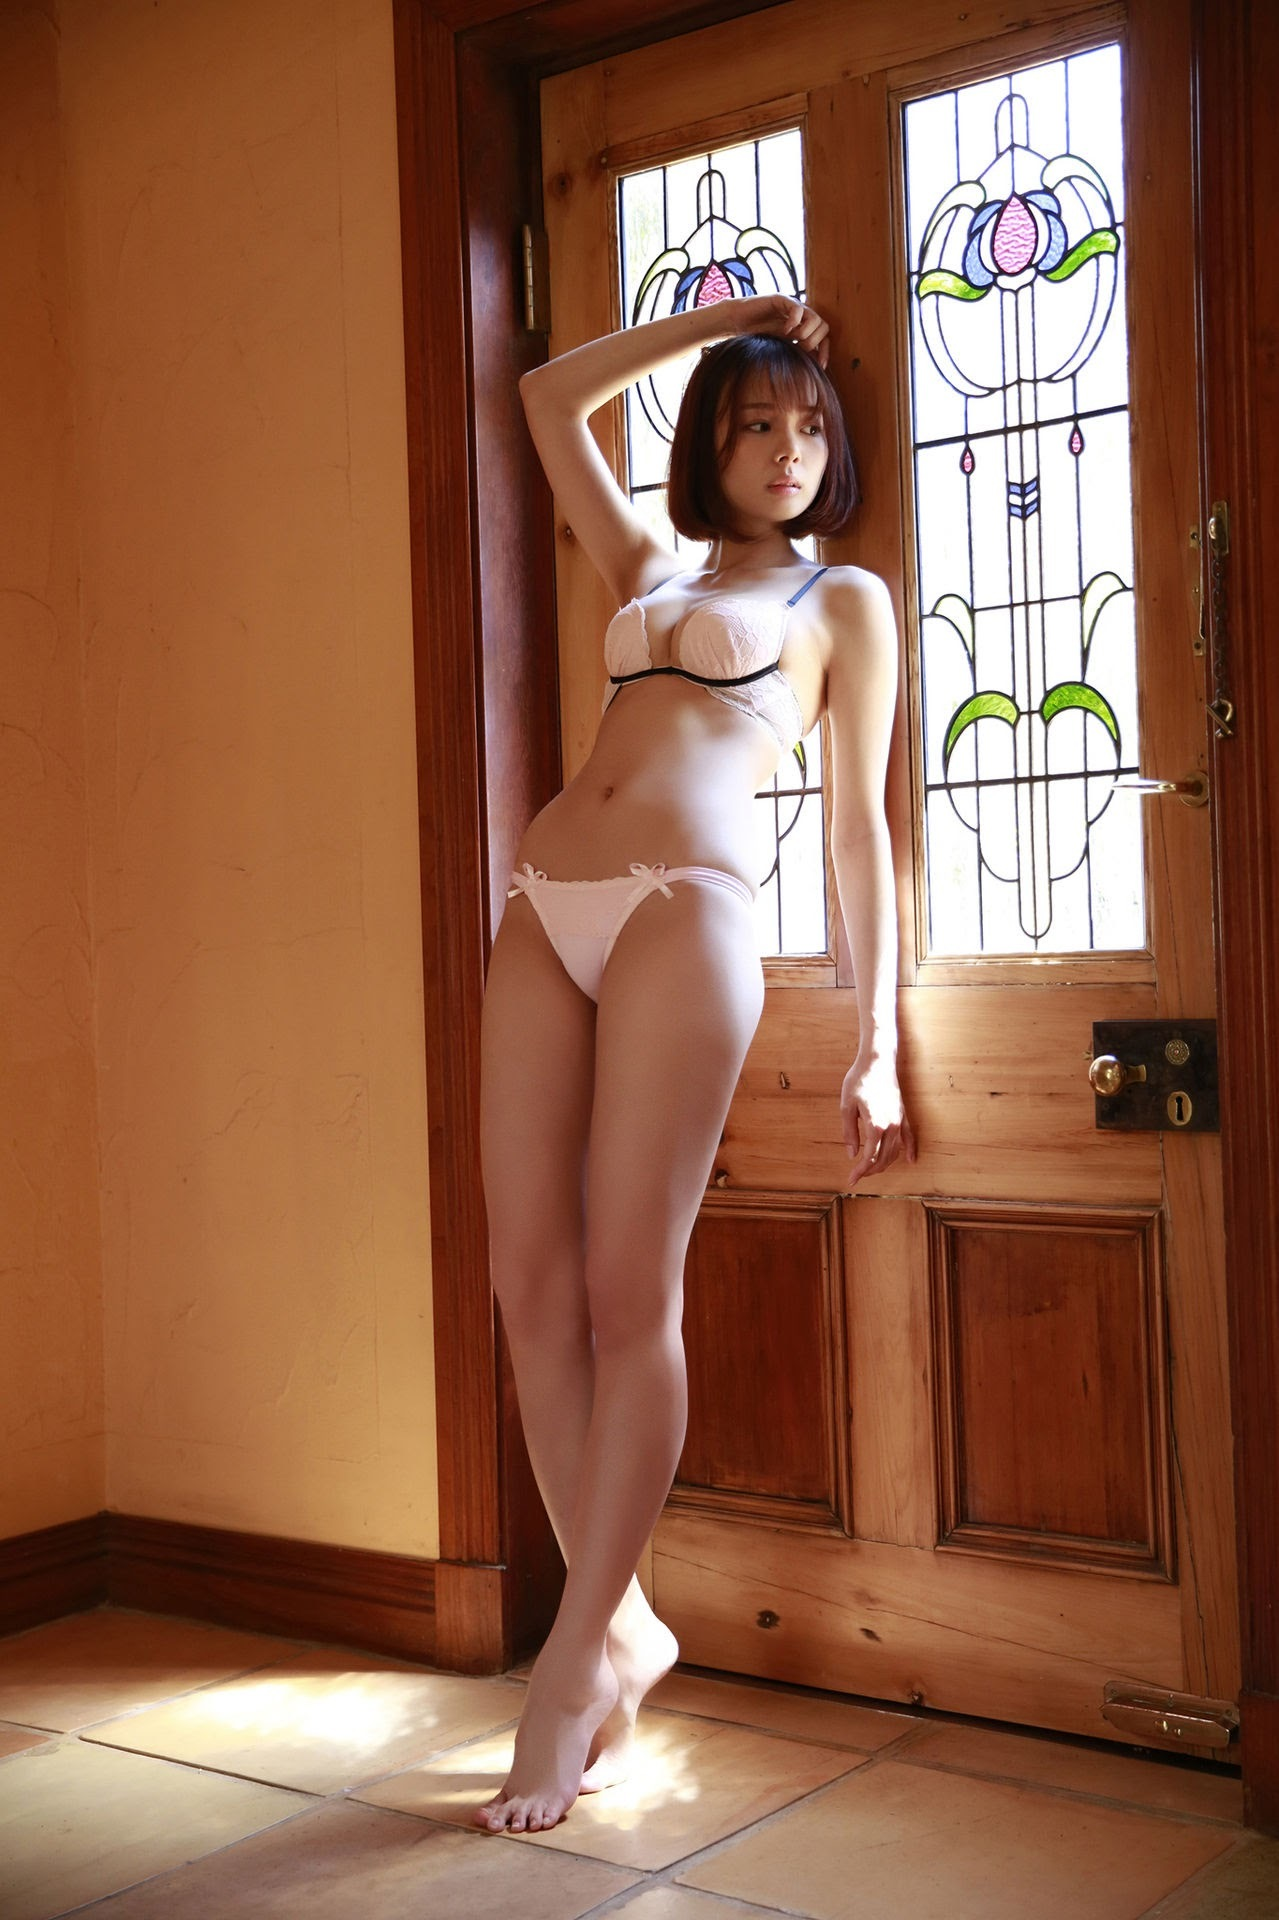 23 years old Shaka Okada, who is also a professional mahjong player034